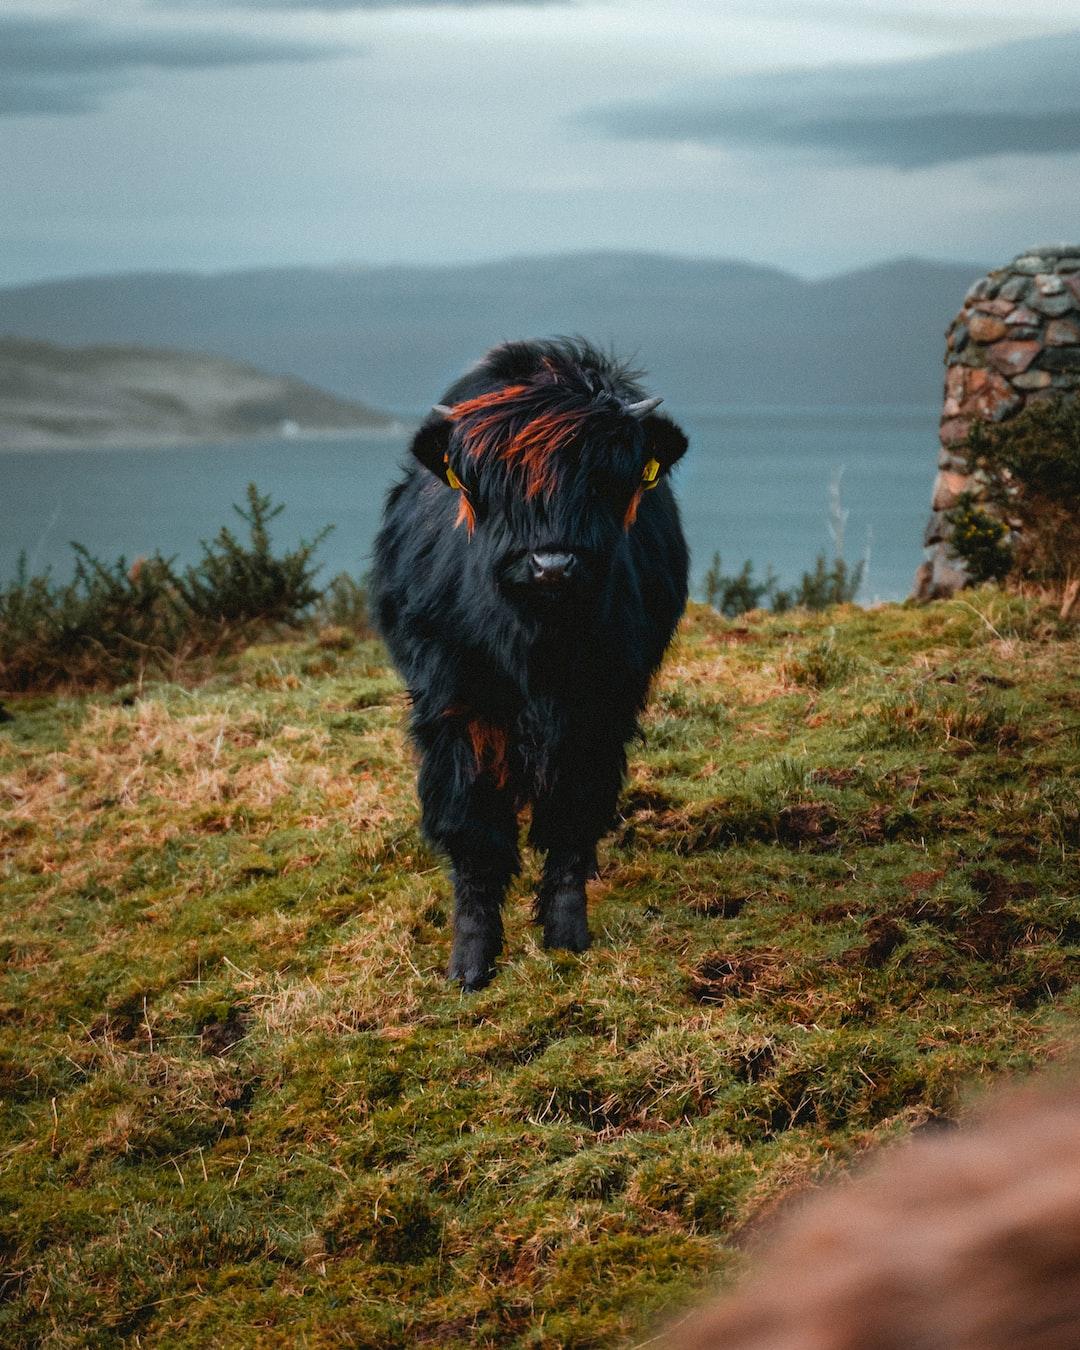 A smol (small) highlander calf looking very fabulous!